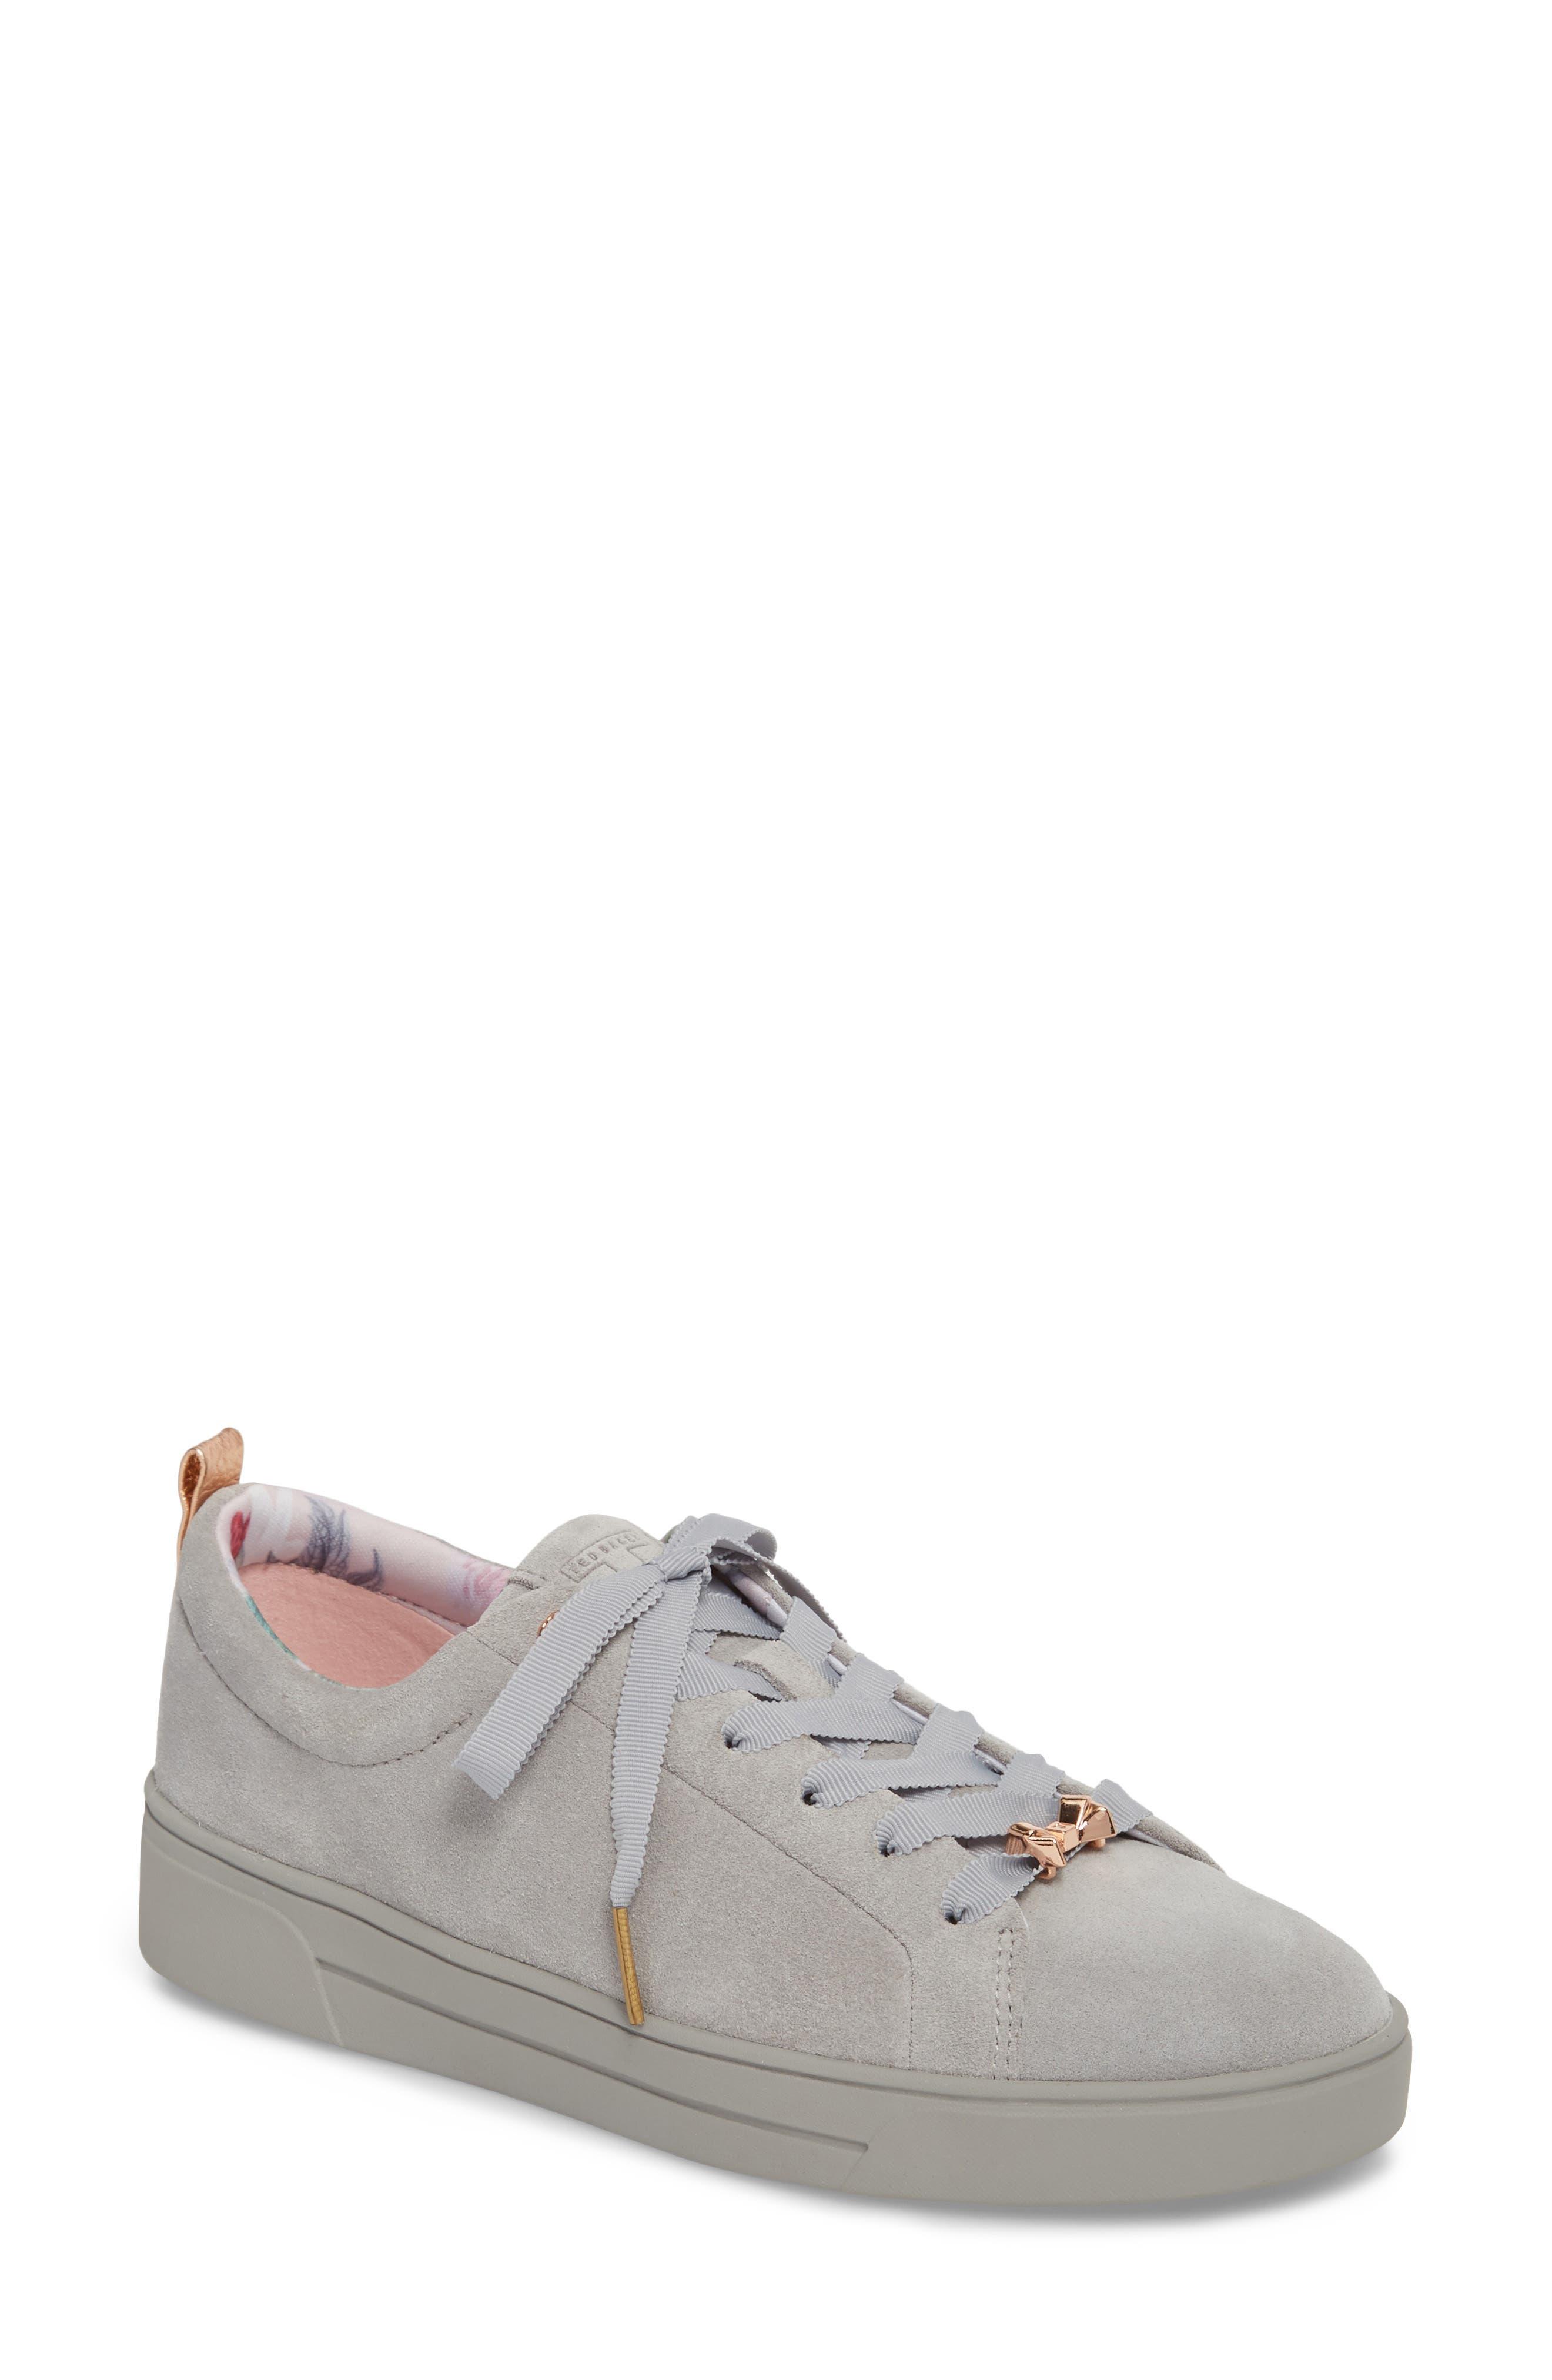 Kelleis Sneaker,                             Main thumbnail 1, color,                             052